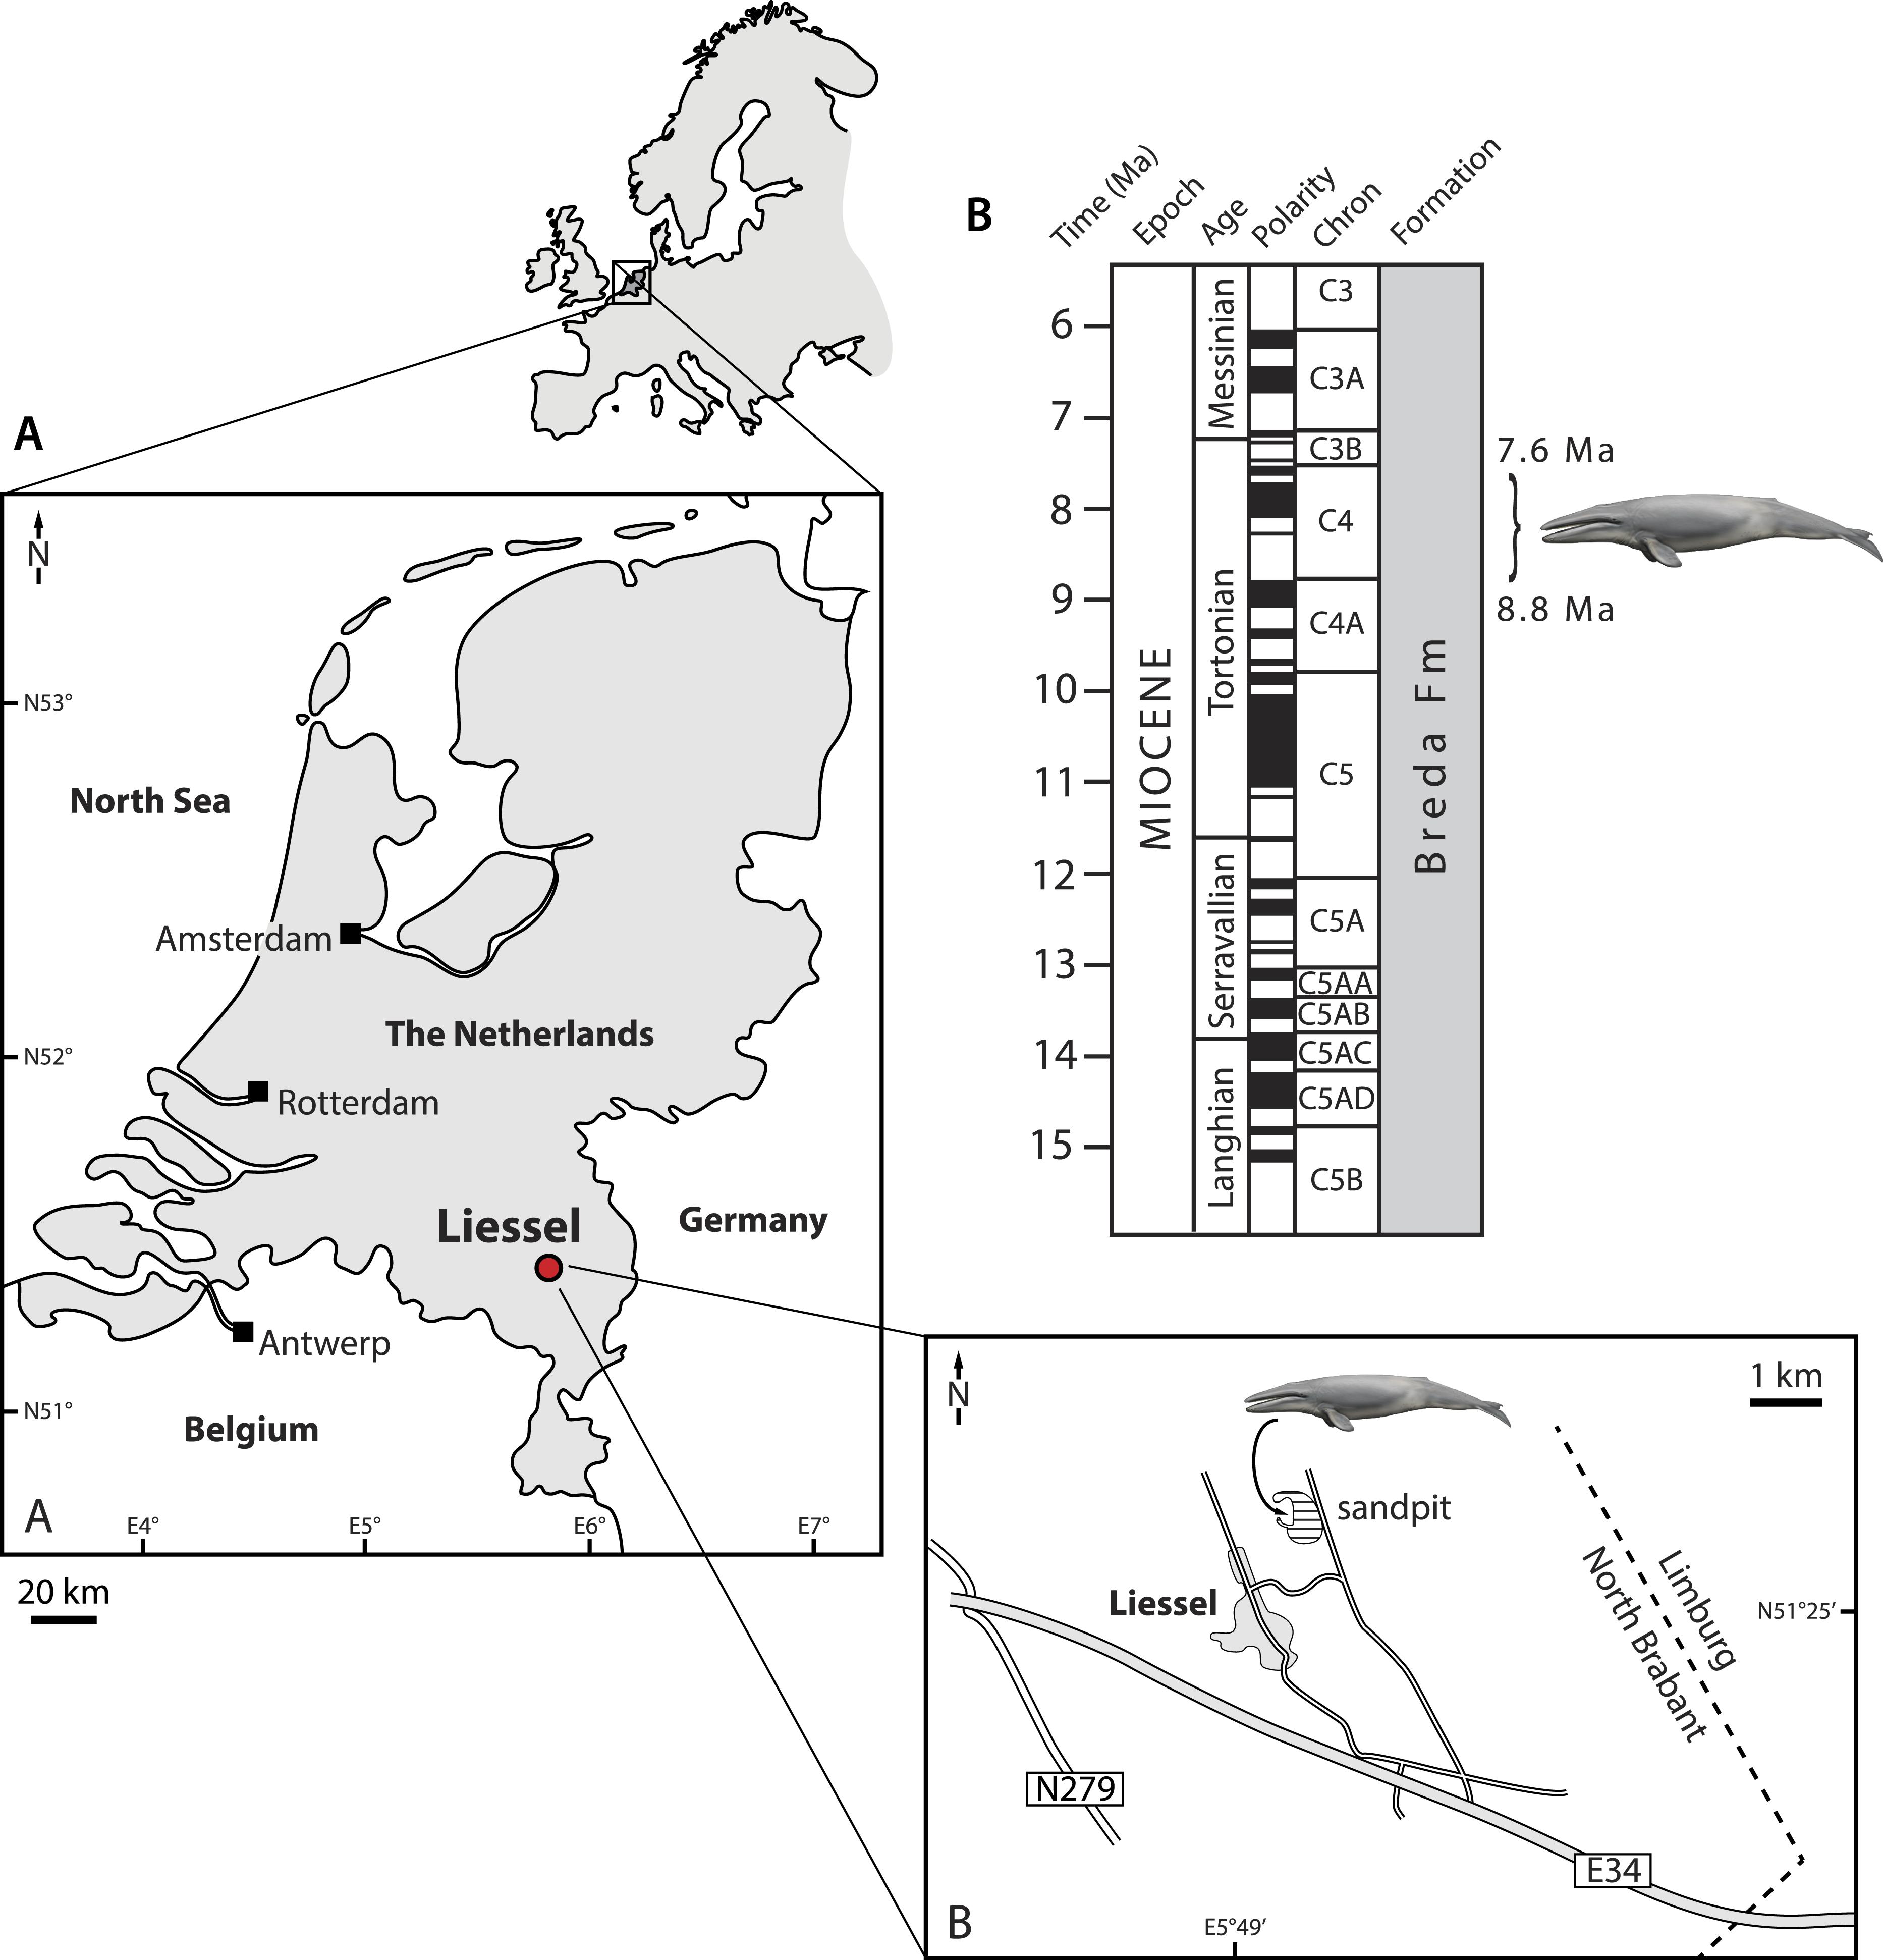 A new species of Metopocetus (Cetacea, Mysticeti, Cetotheriidae ...